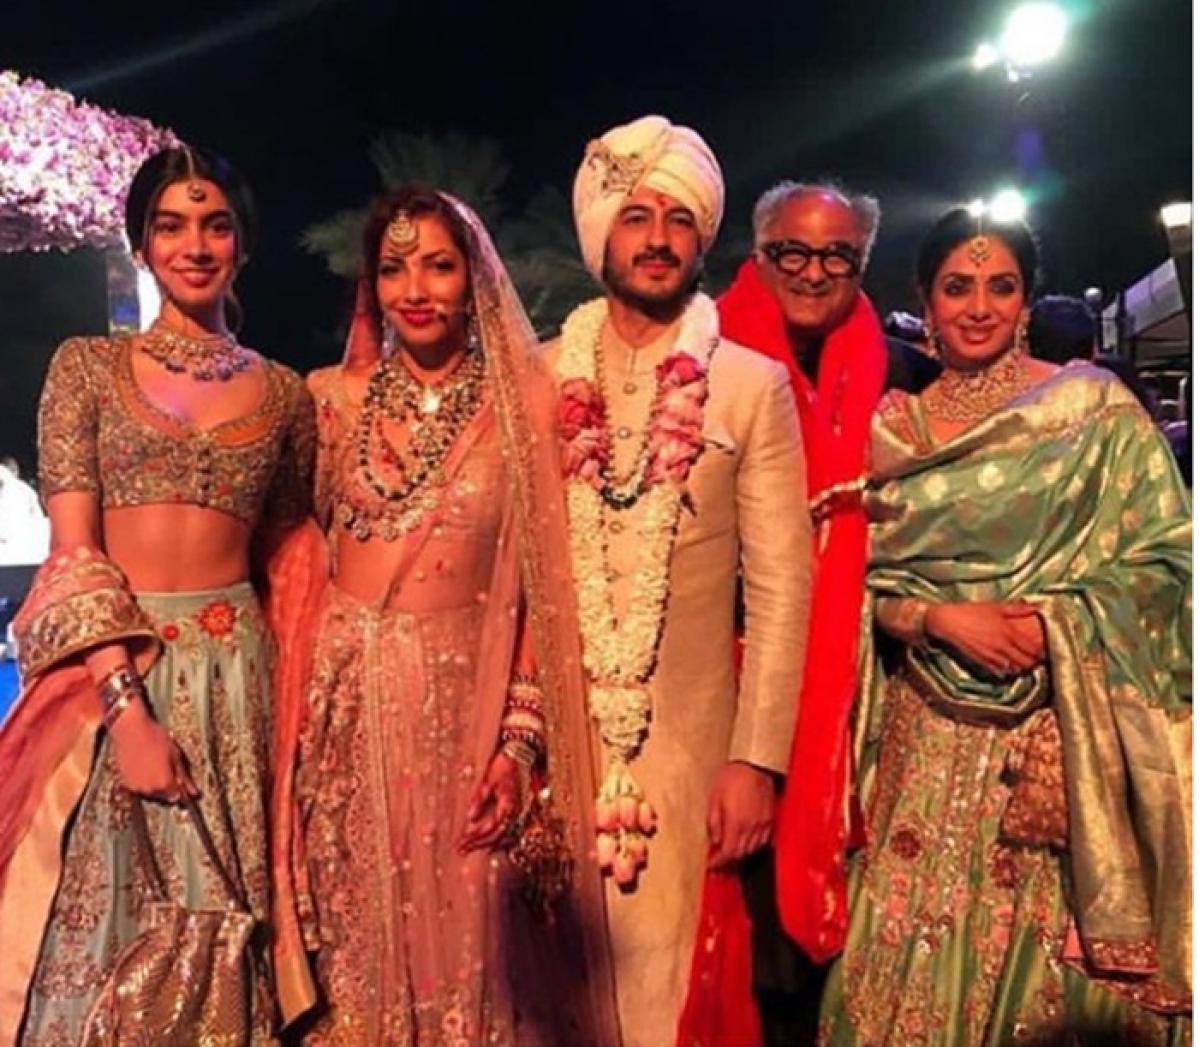 Inside Pictures: Mohit Marwah marries Antara Motiwala; Sonam, Sanaya look elegant; Arjun, Anil the dancing stars